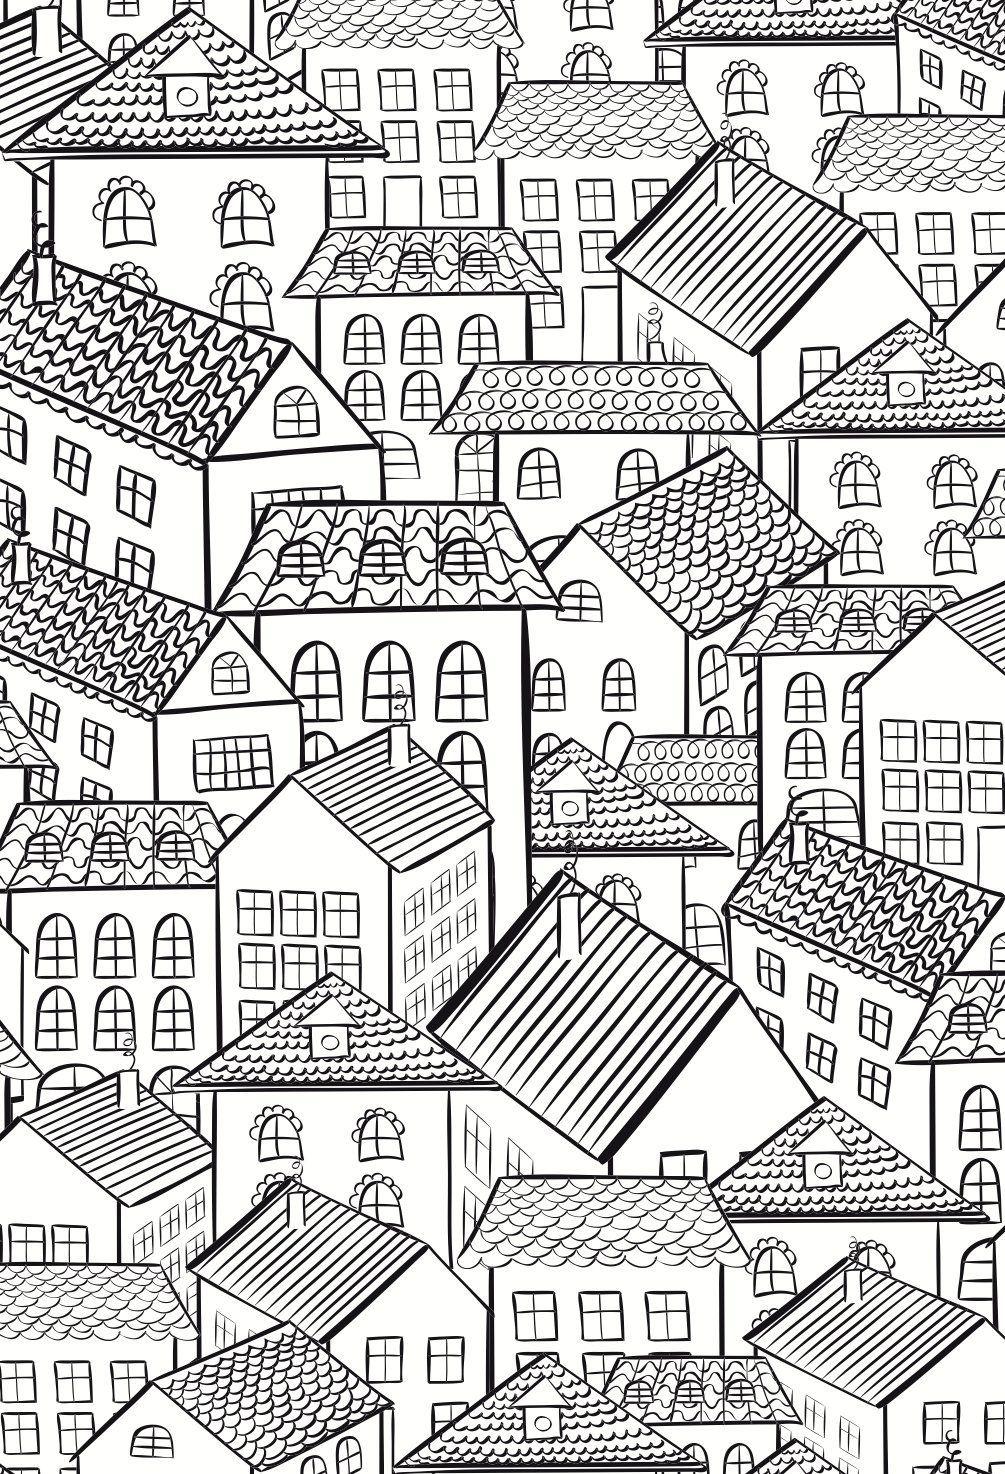 Colouring Books for Adults | Colorear, Casas y Mandalas